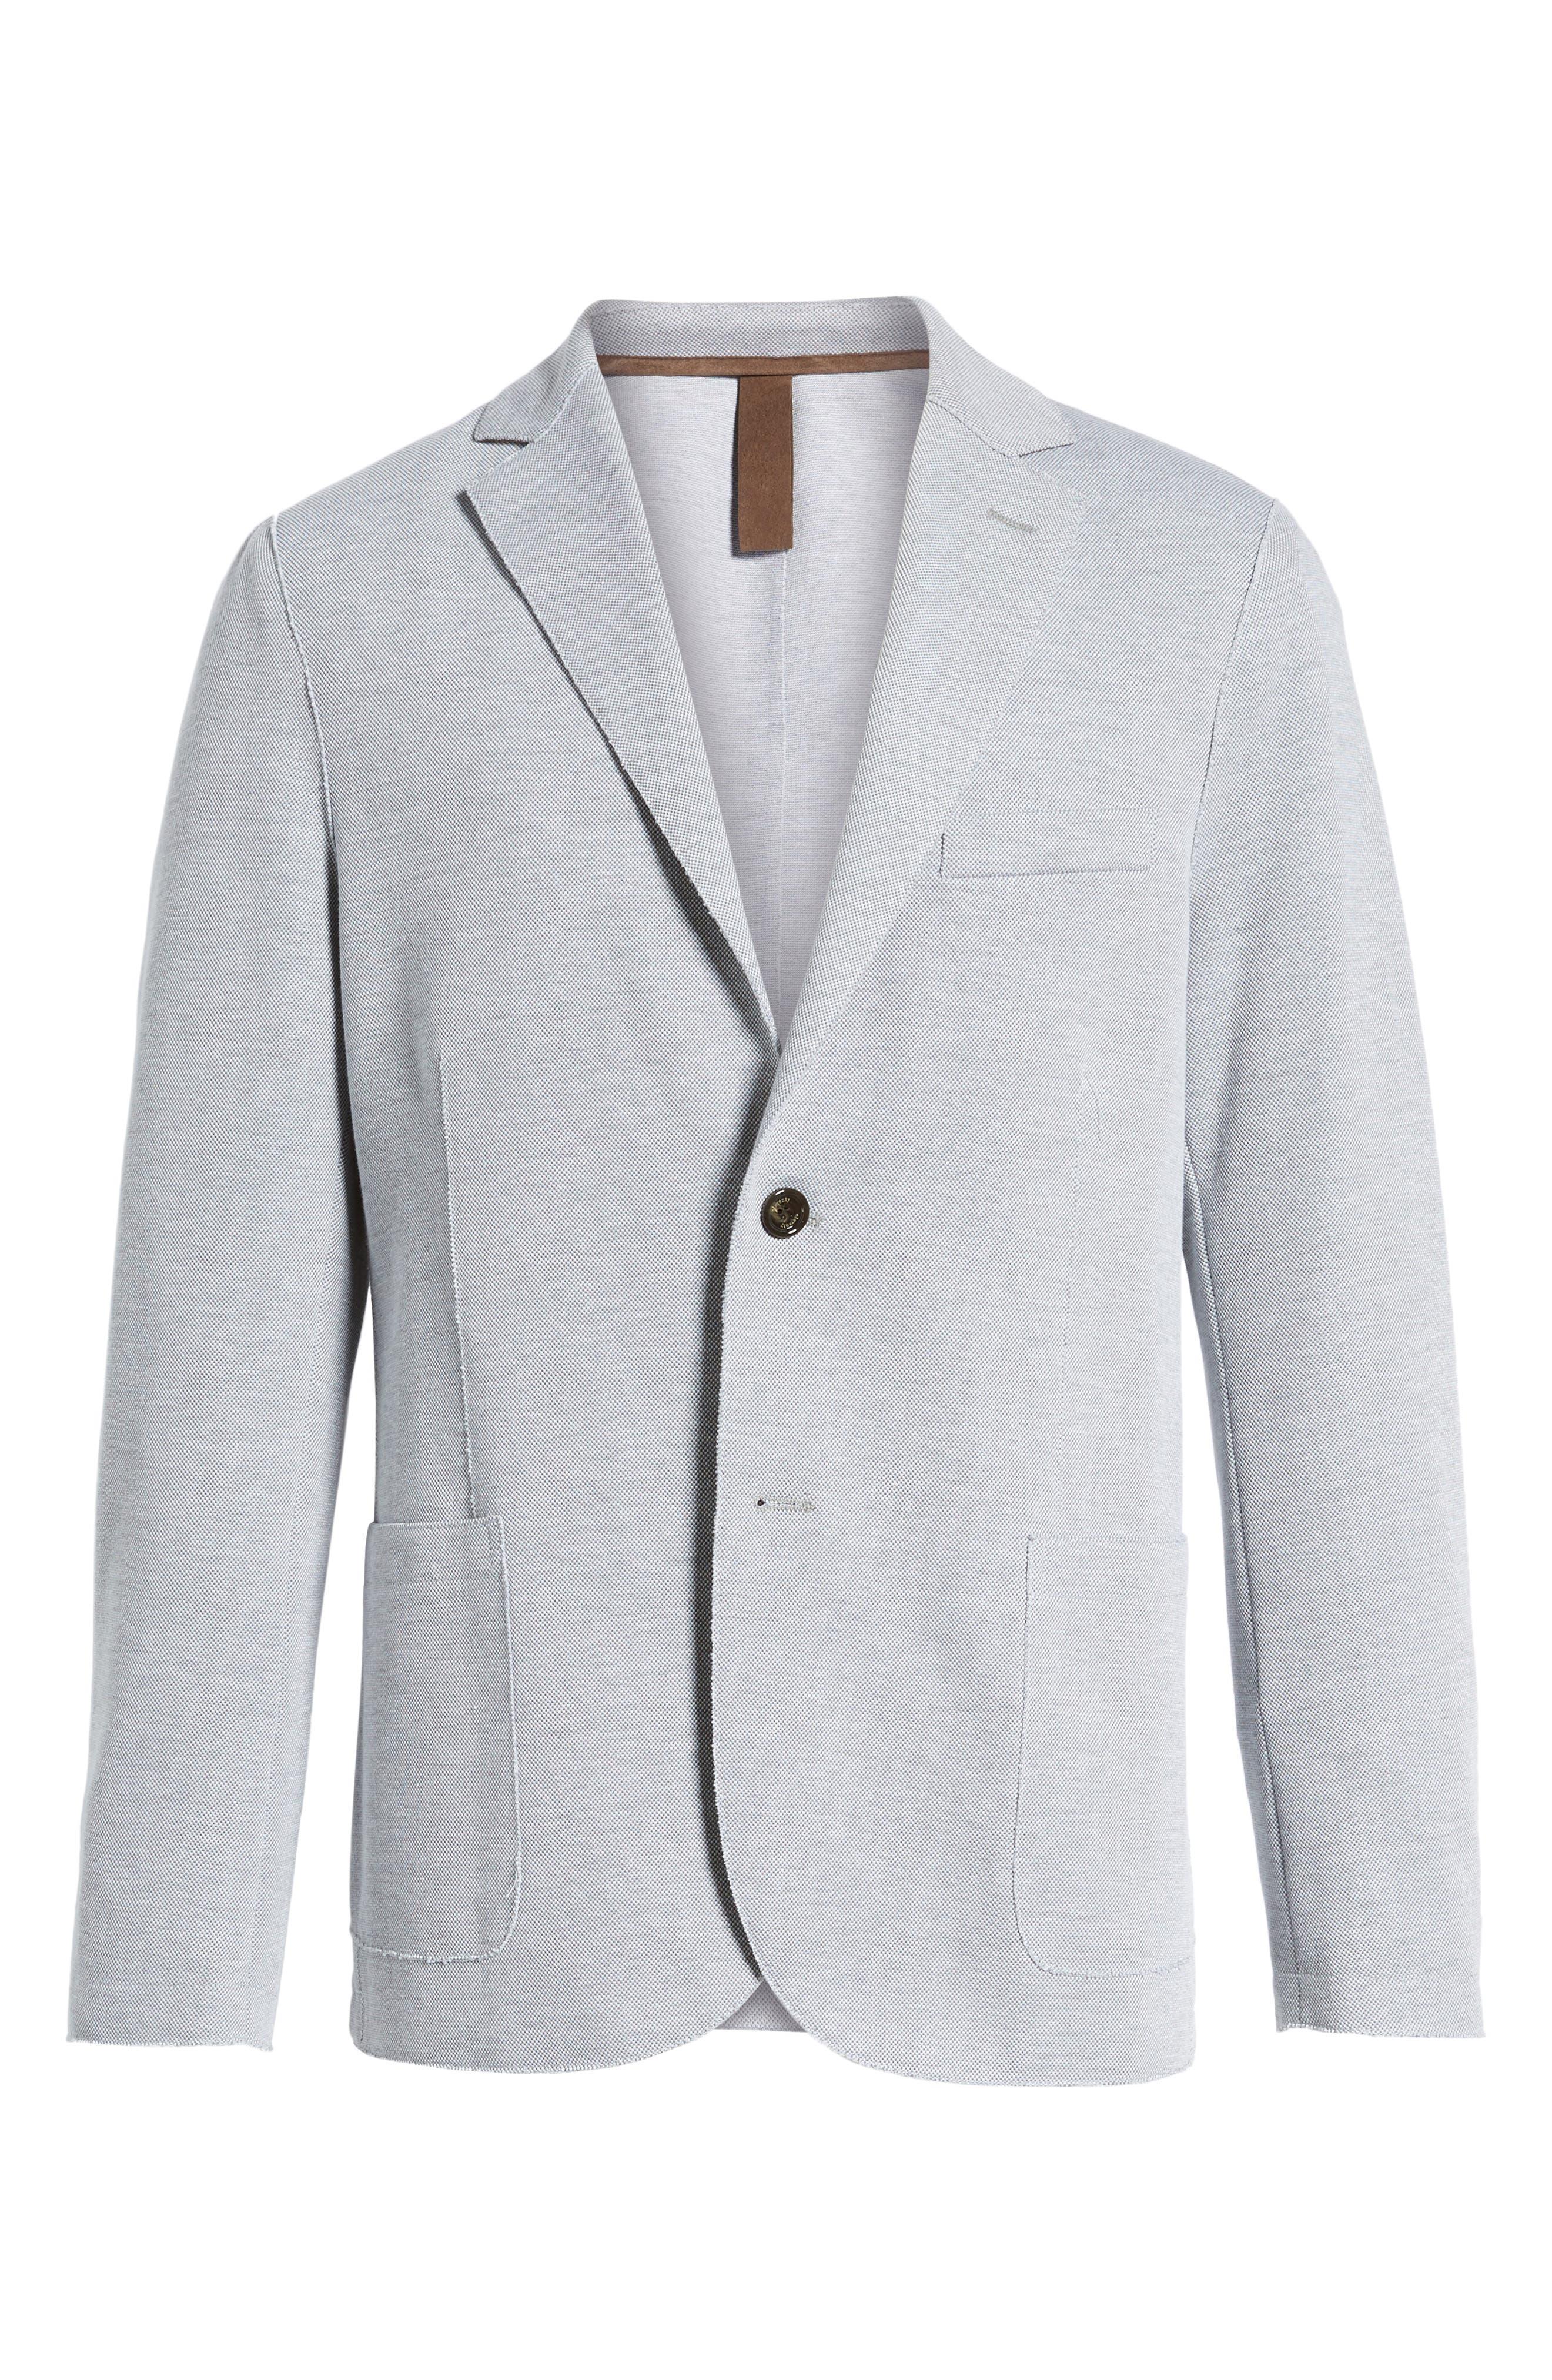 Trim Fit Jersey Blazer,                             Alternate thumbnail 5, color,                             GREY